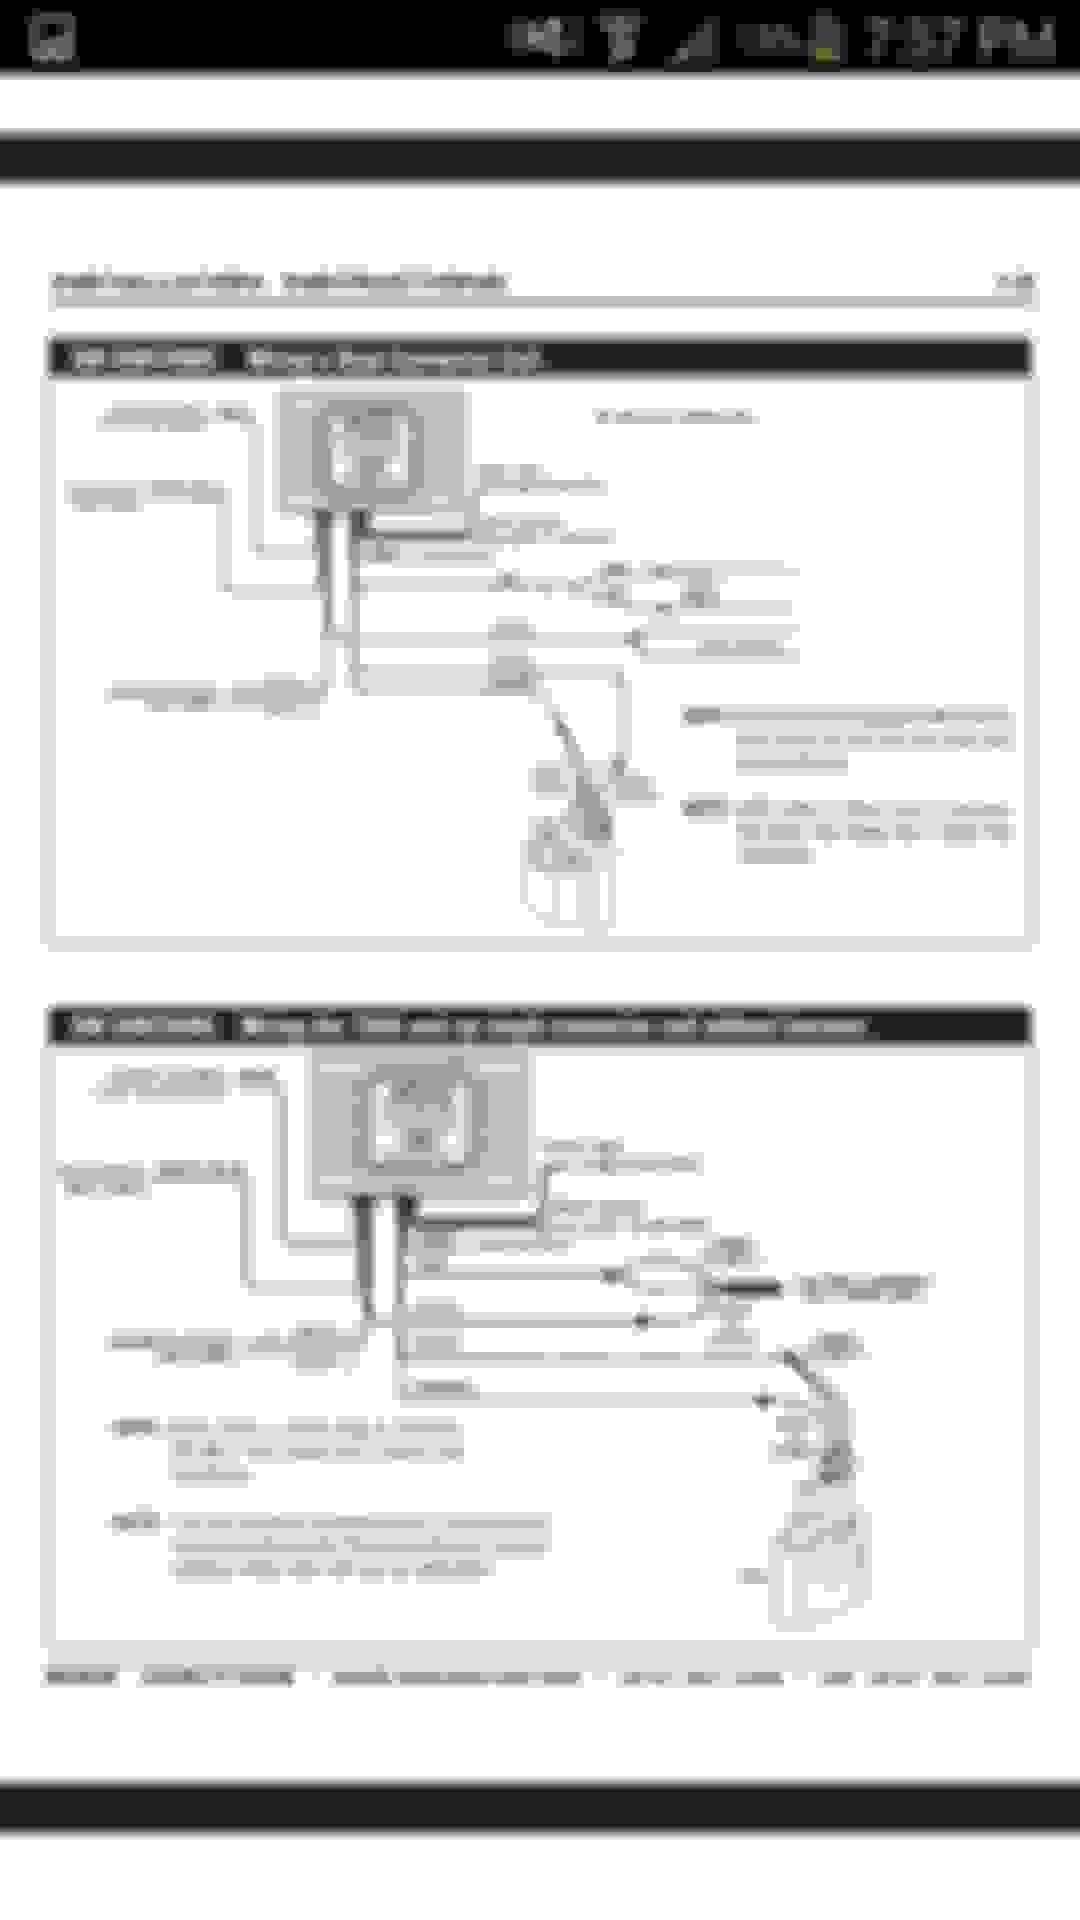 Wiring Diagram Msd Digital 6al Wiring Diagram Msd 8680 Wiring Diagram